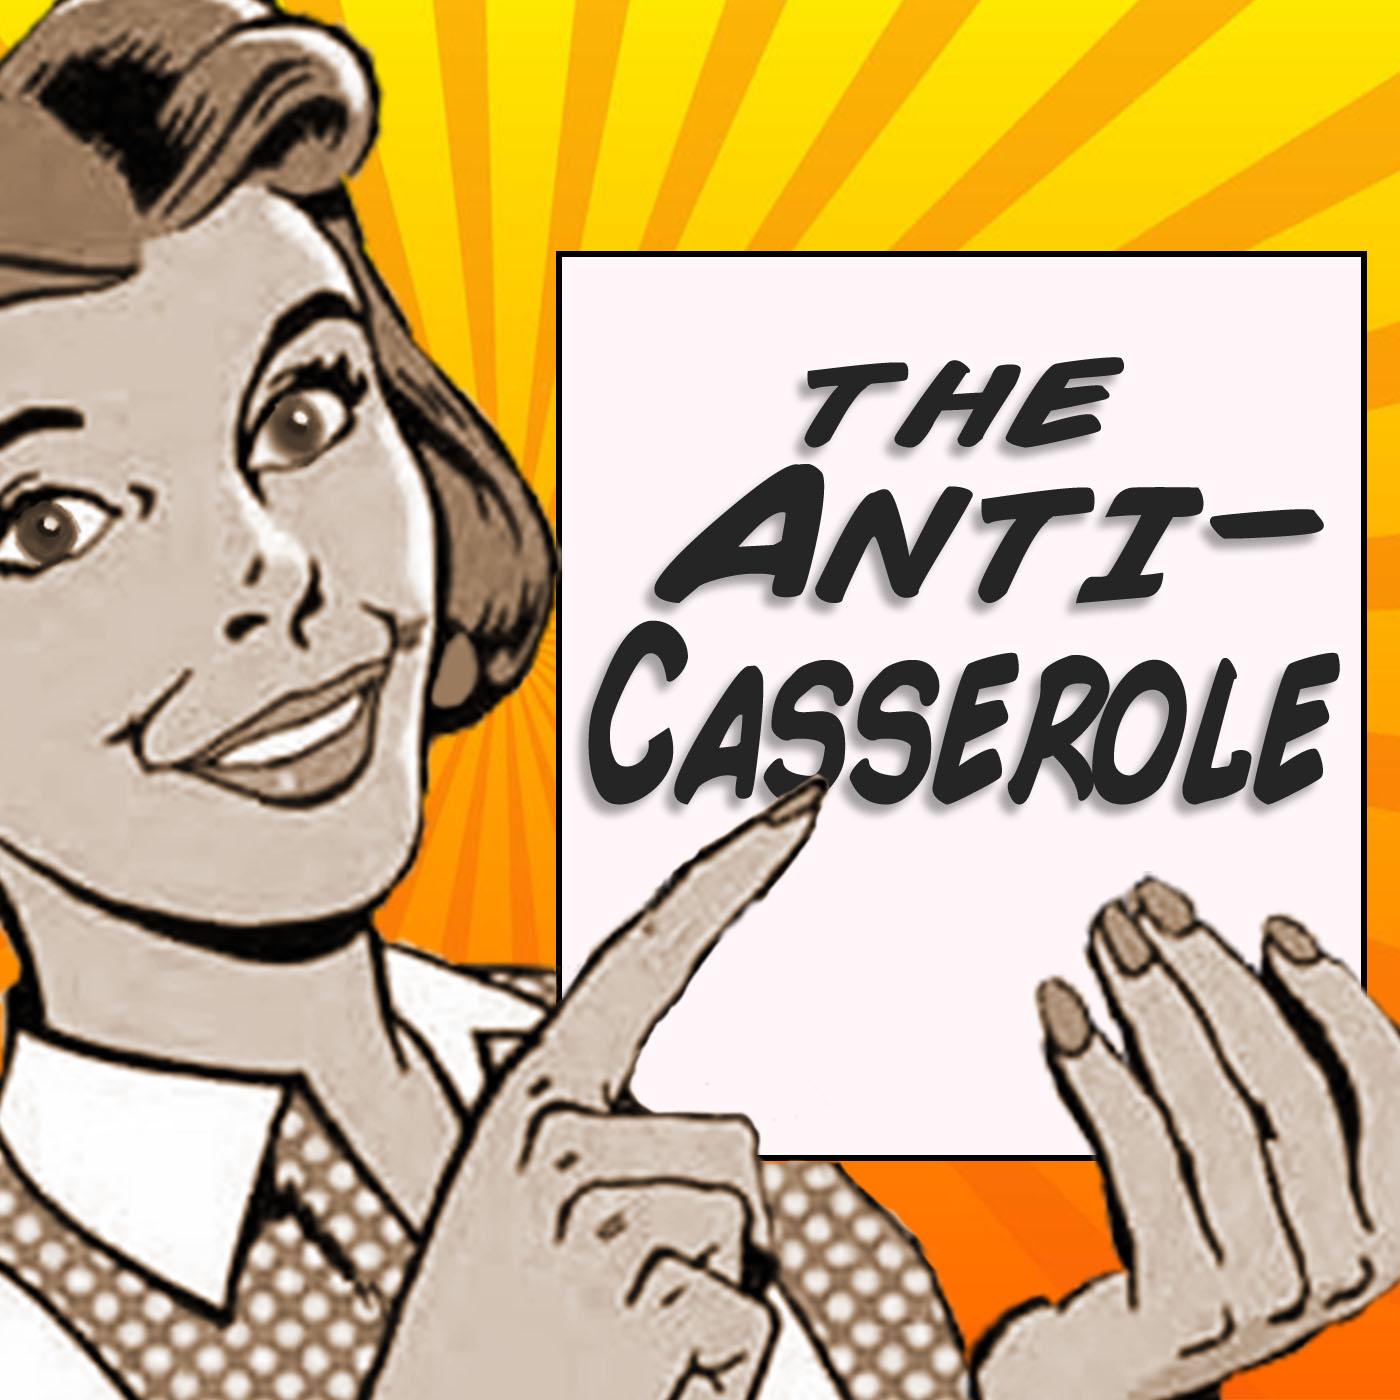 The Anti-Casserole